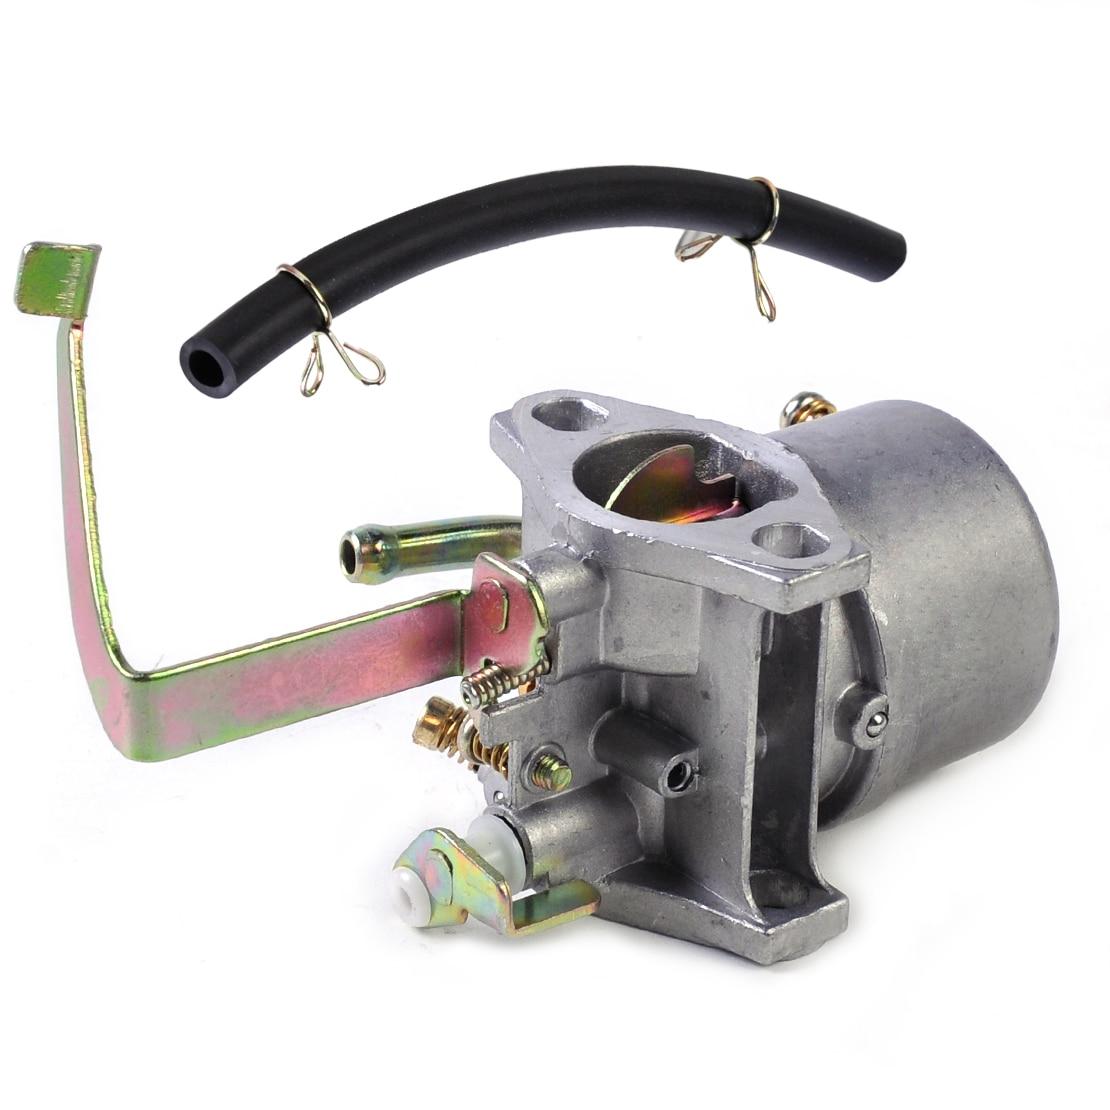 BIG SALE) Replace Huayi 950 Gasoline Generator Carburetor